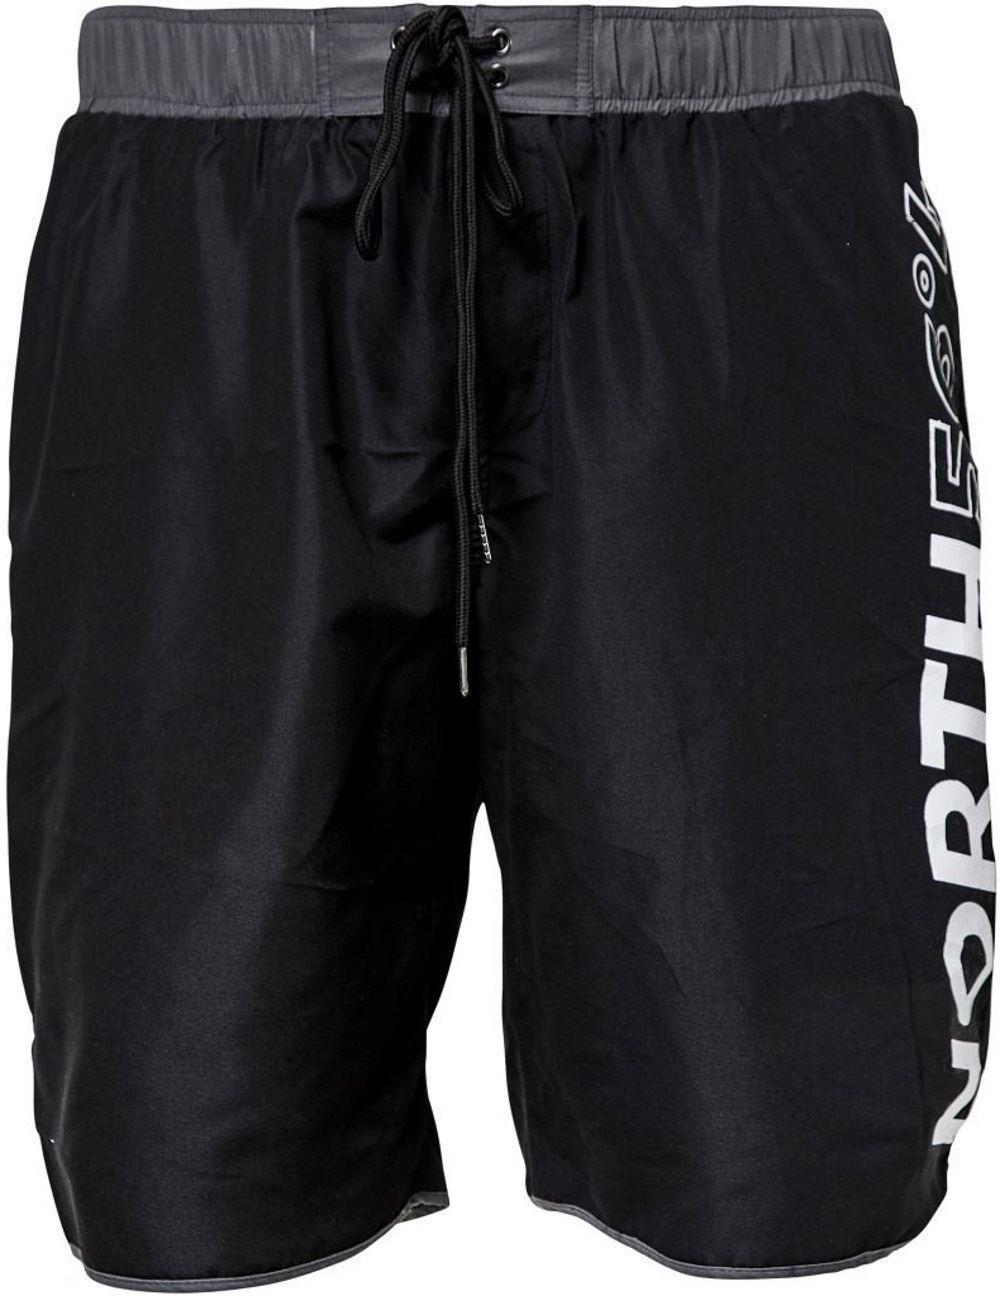 North564 Swim Shorts With Distinctive Logo - Black